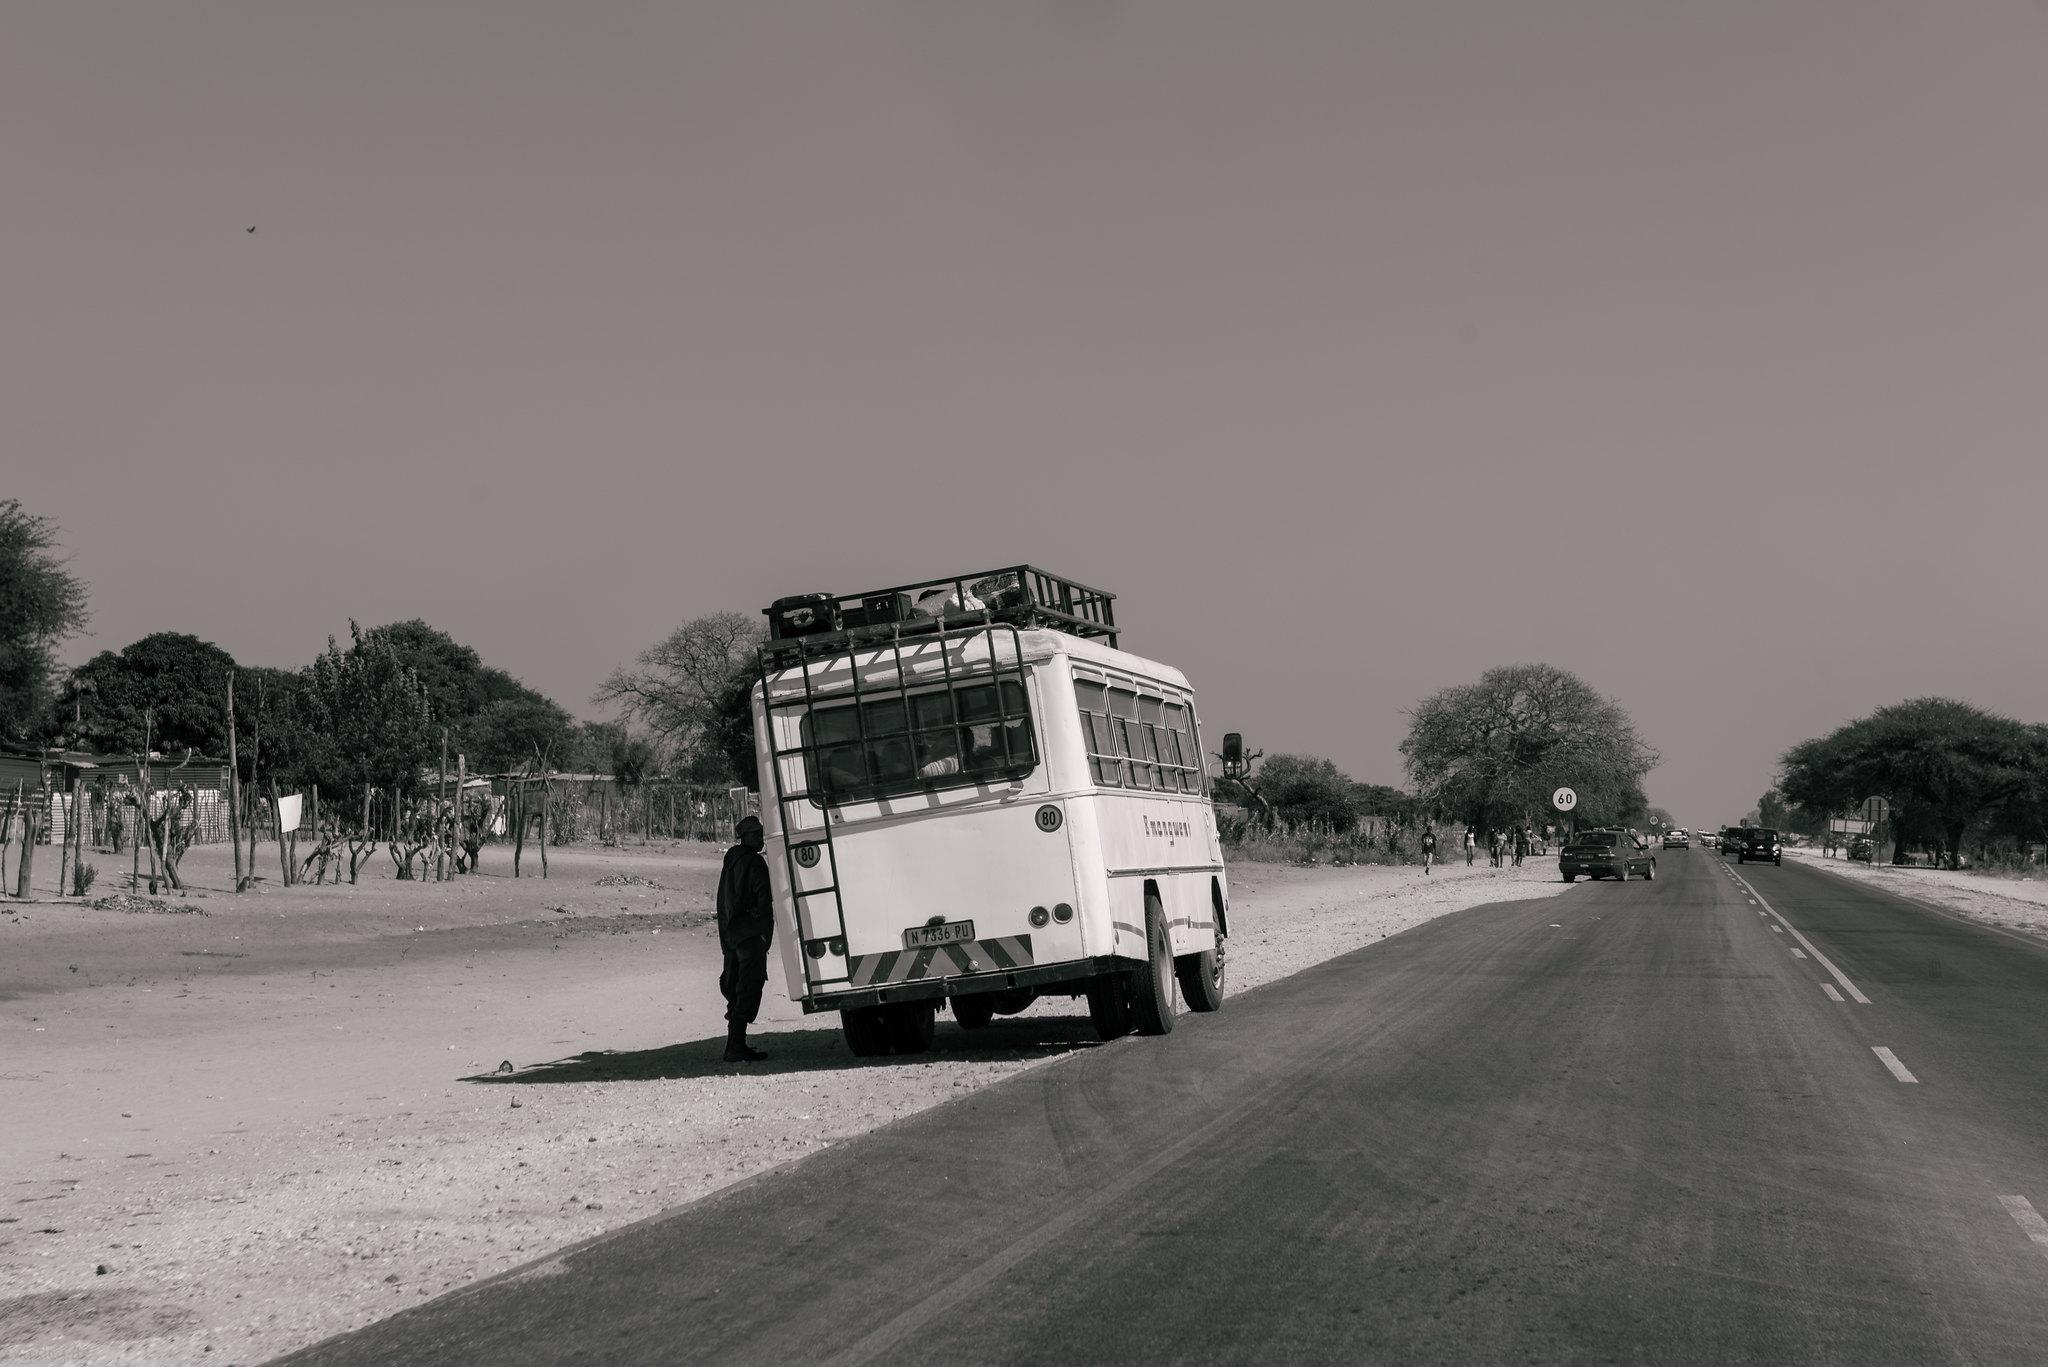 Overland bus